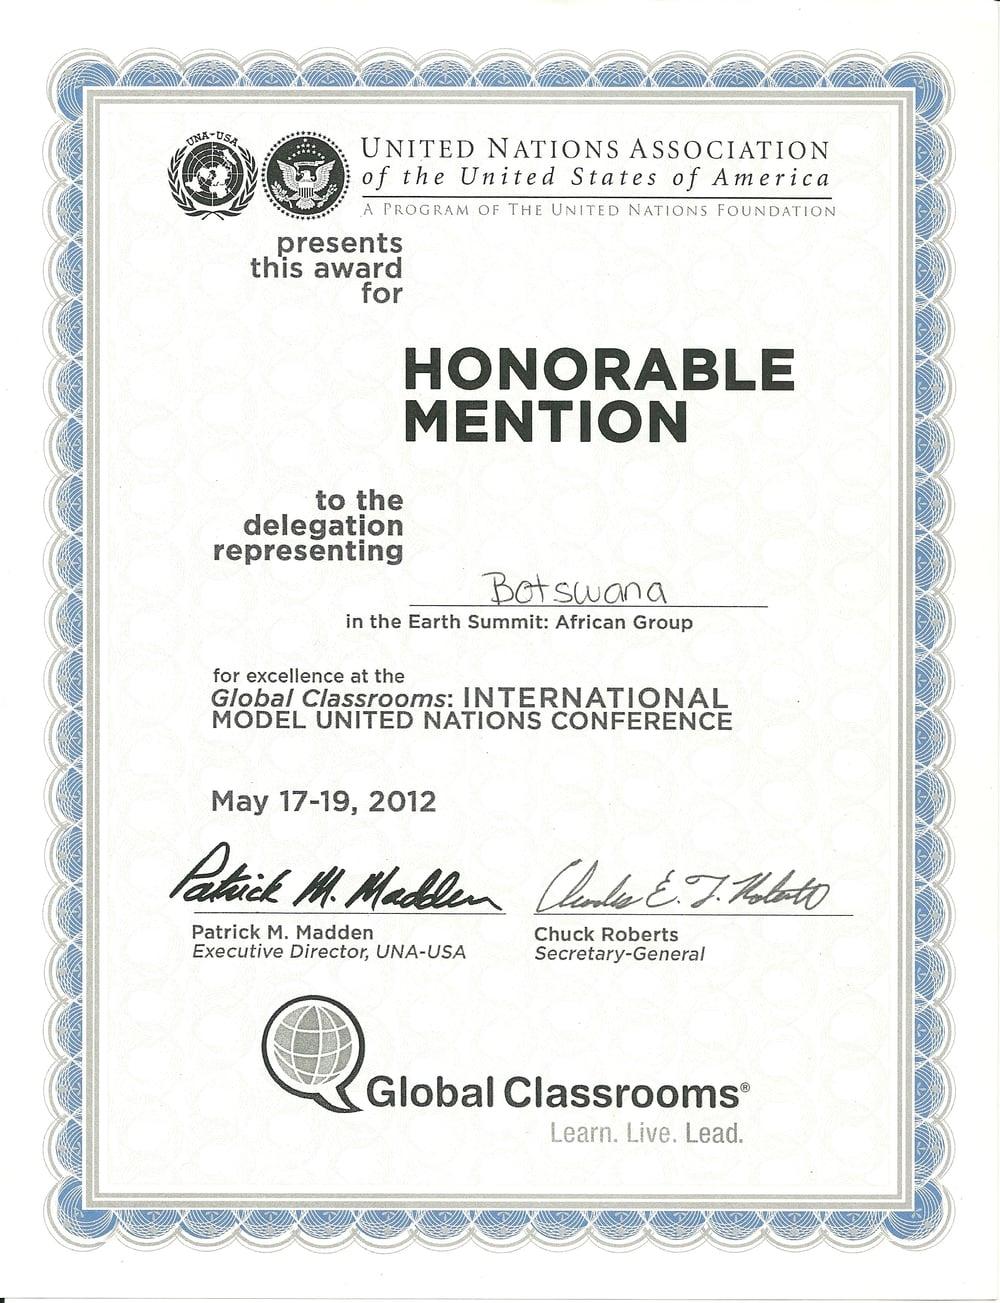 Global Classrooms International Model United Nations